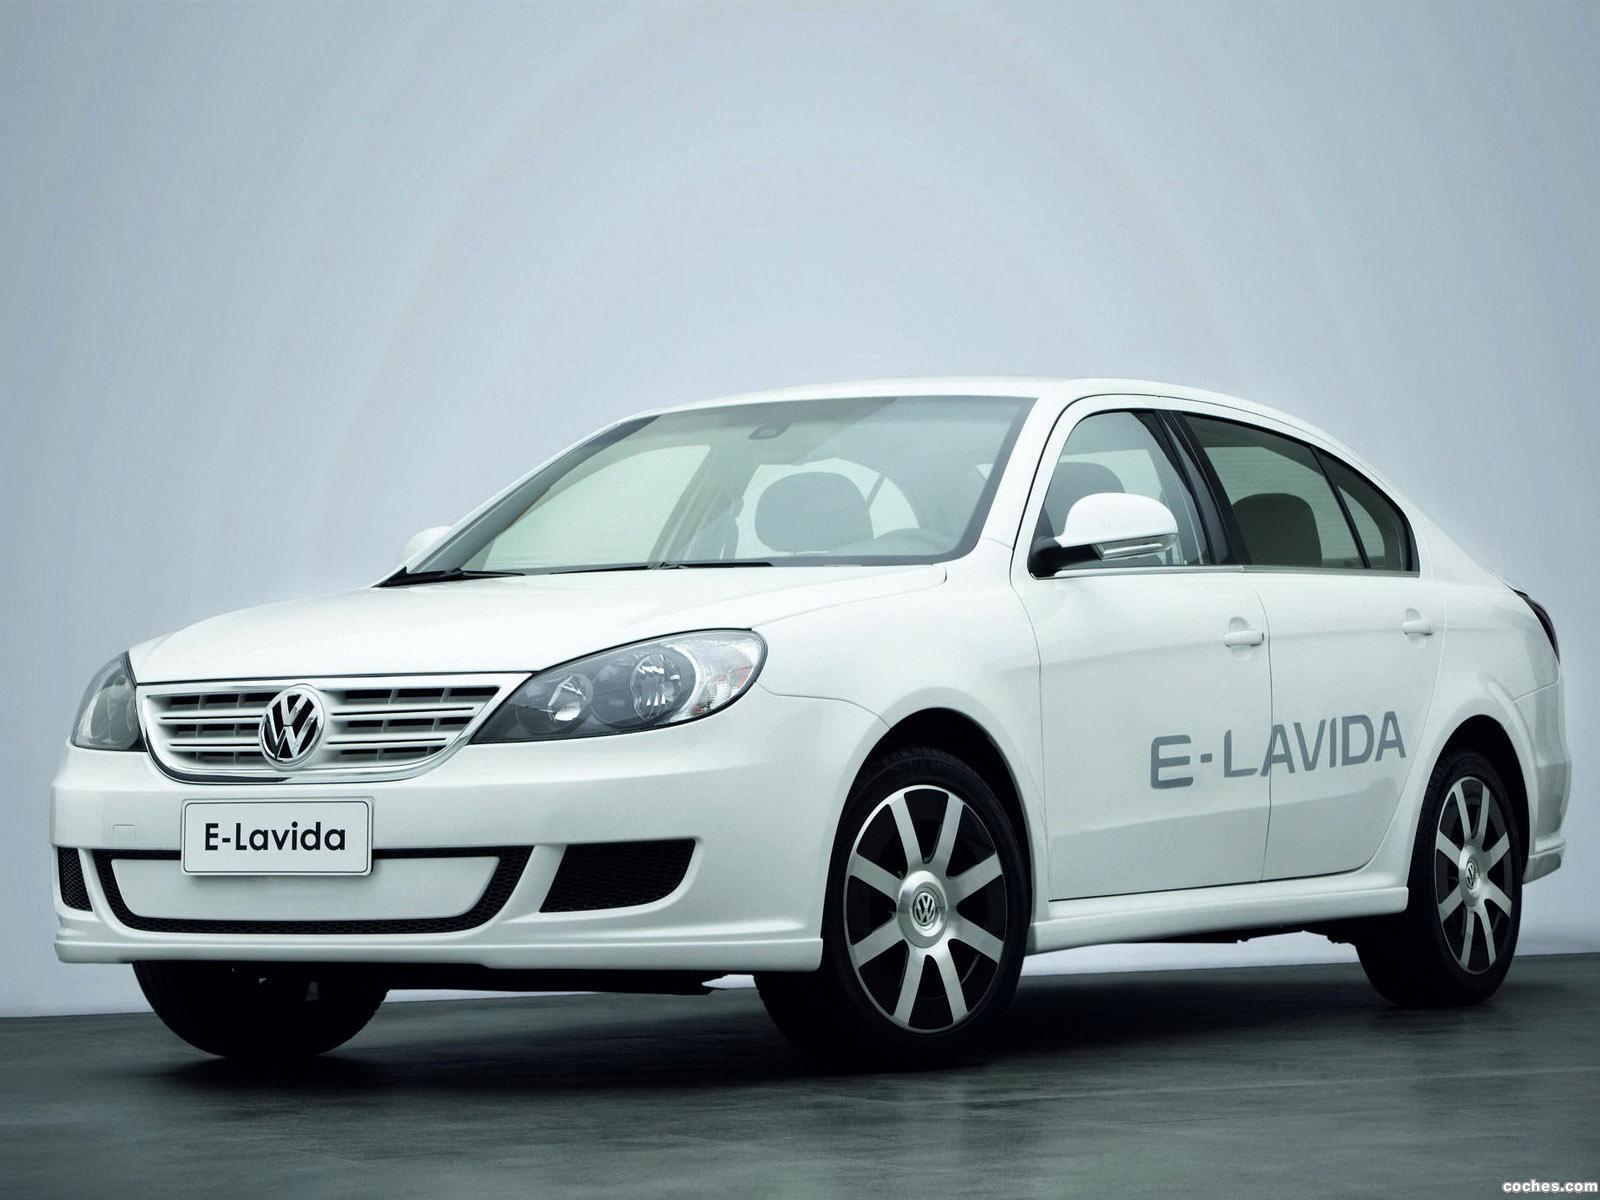 Foto 0 de Volkswagen E-Lavida Concept 2010